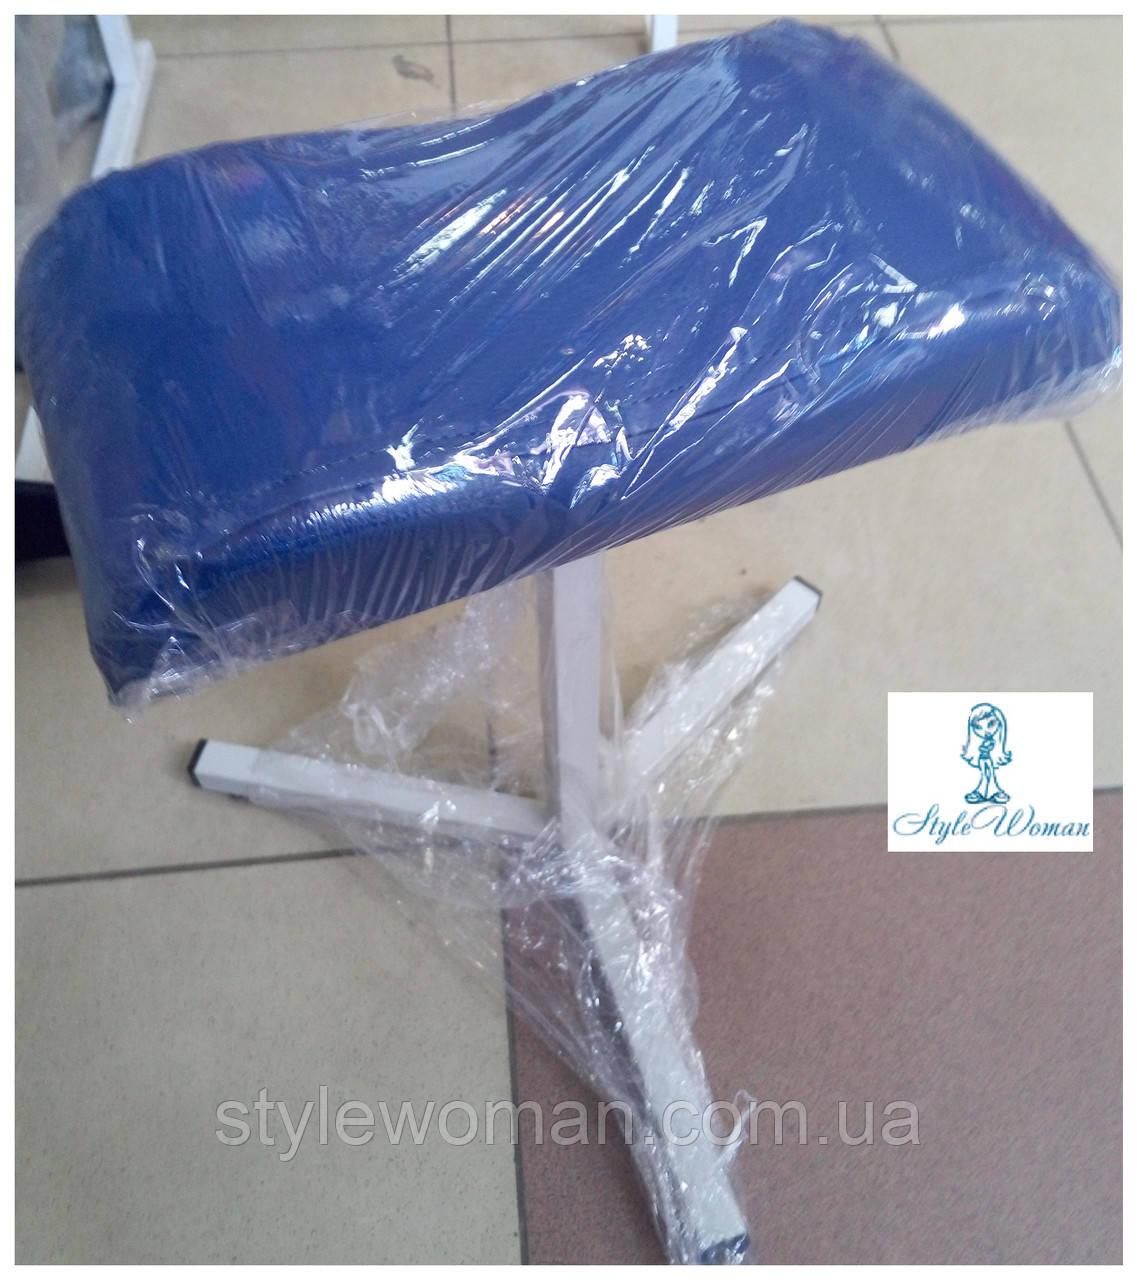 Тренога для педикюра из кожзама подставка синяя, фото 1